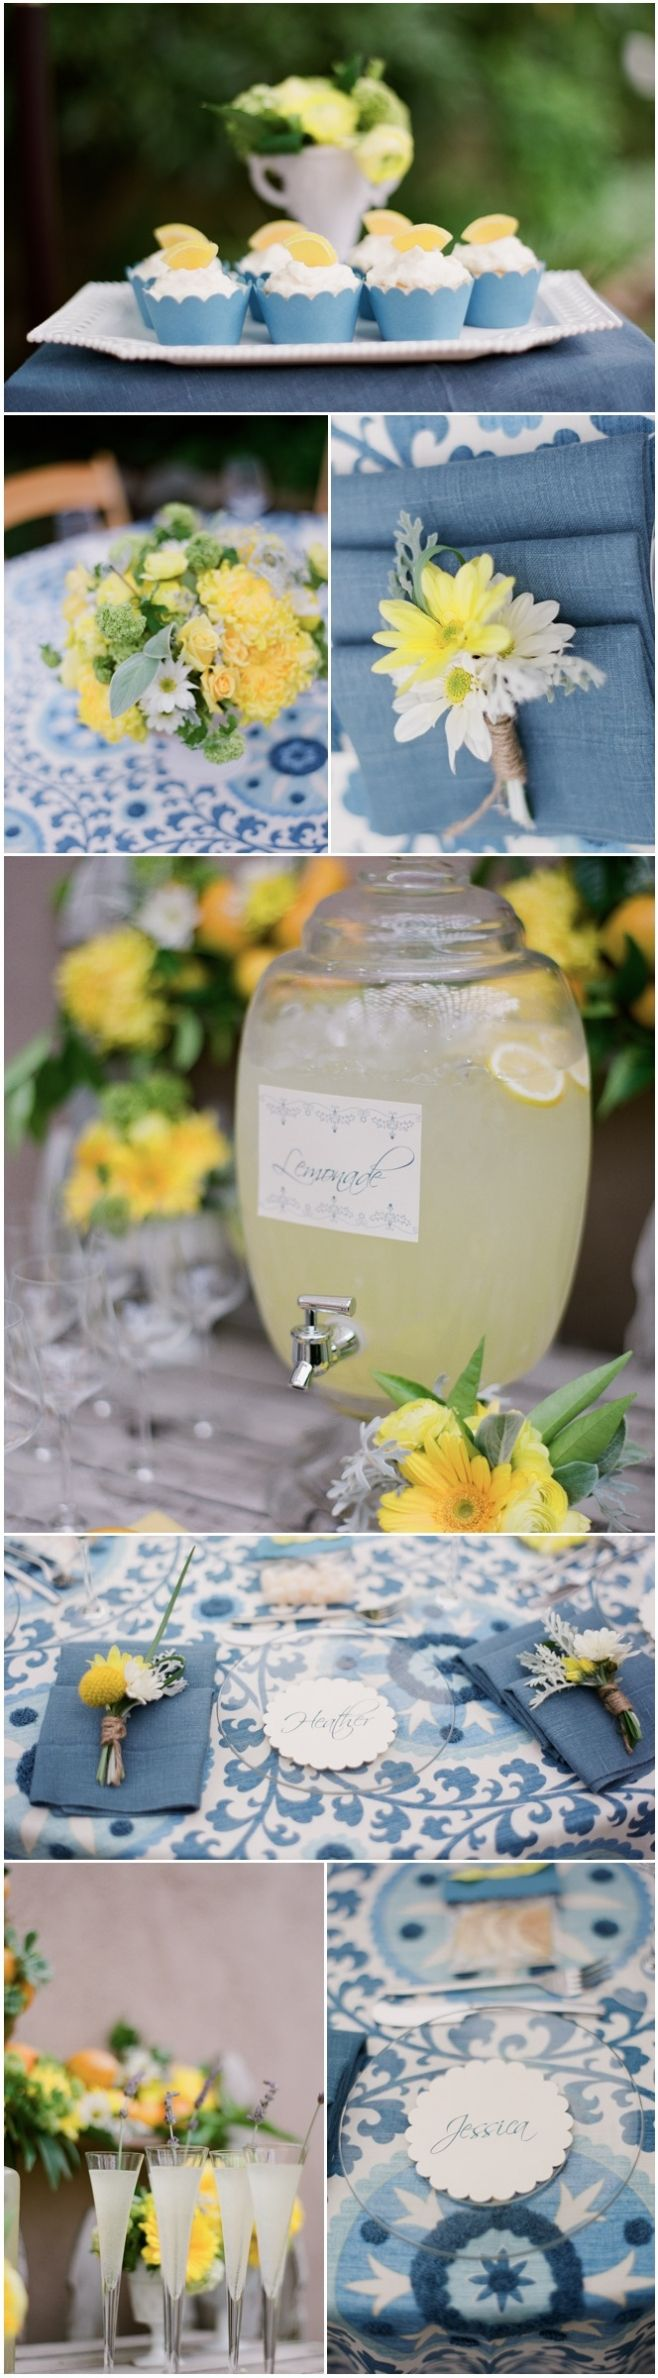 Bridal Shower Gift Destination Wedding : weddings citrus fete weddings yard weddings citrus wedding weddings ...